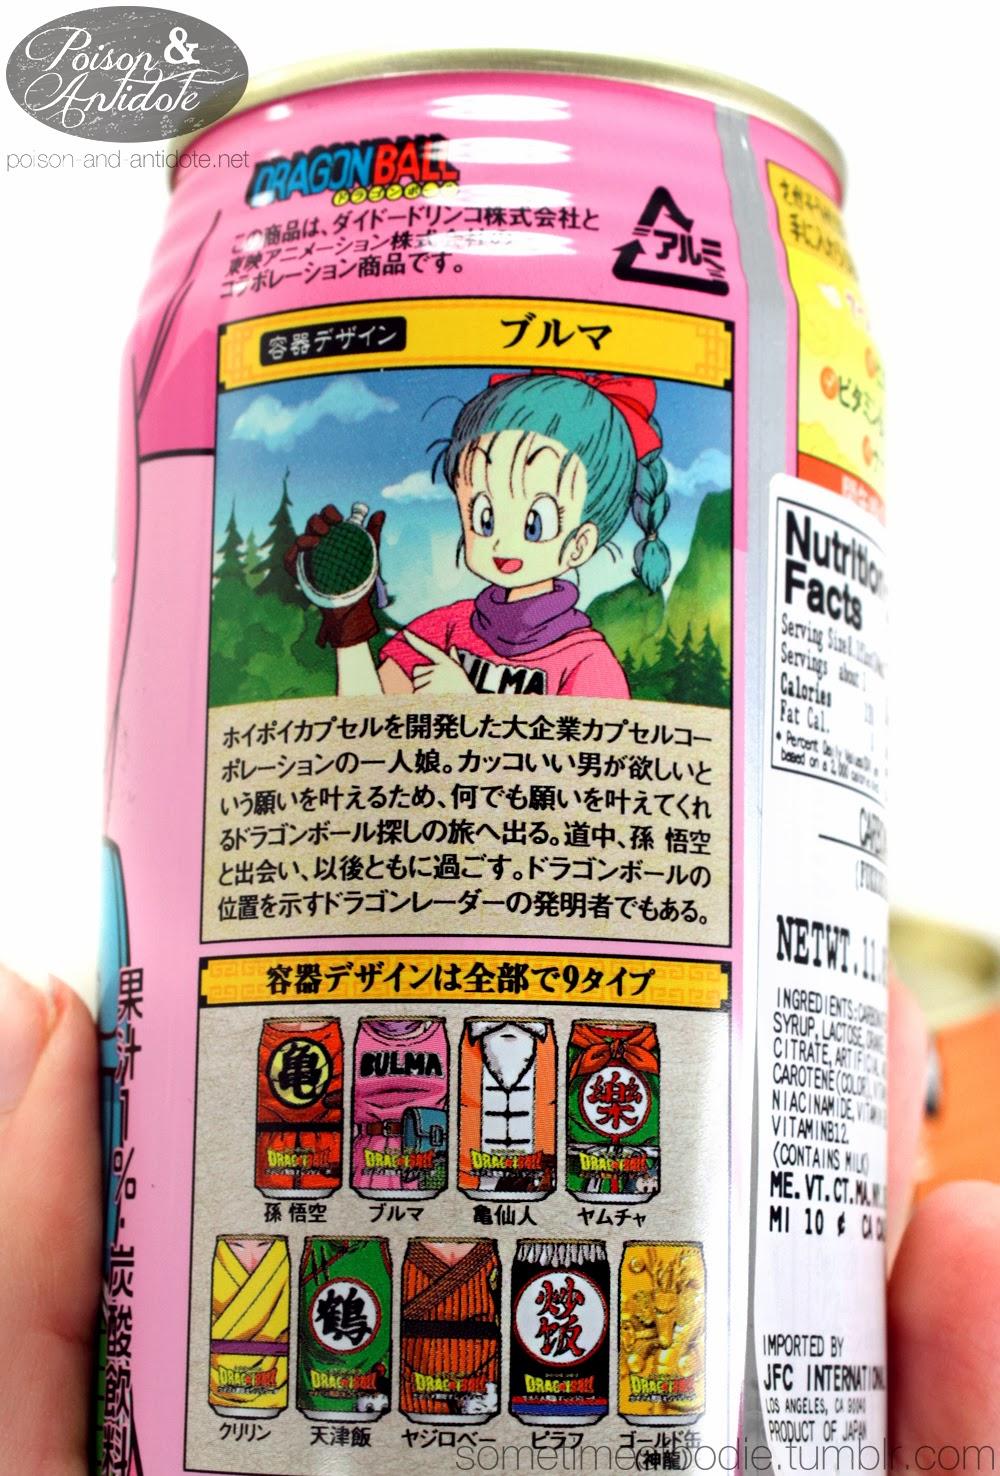 Sometimes Foodie Dragon Ball Soda Sunsengmarket